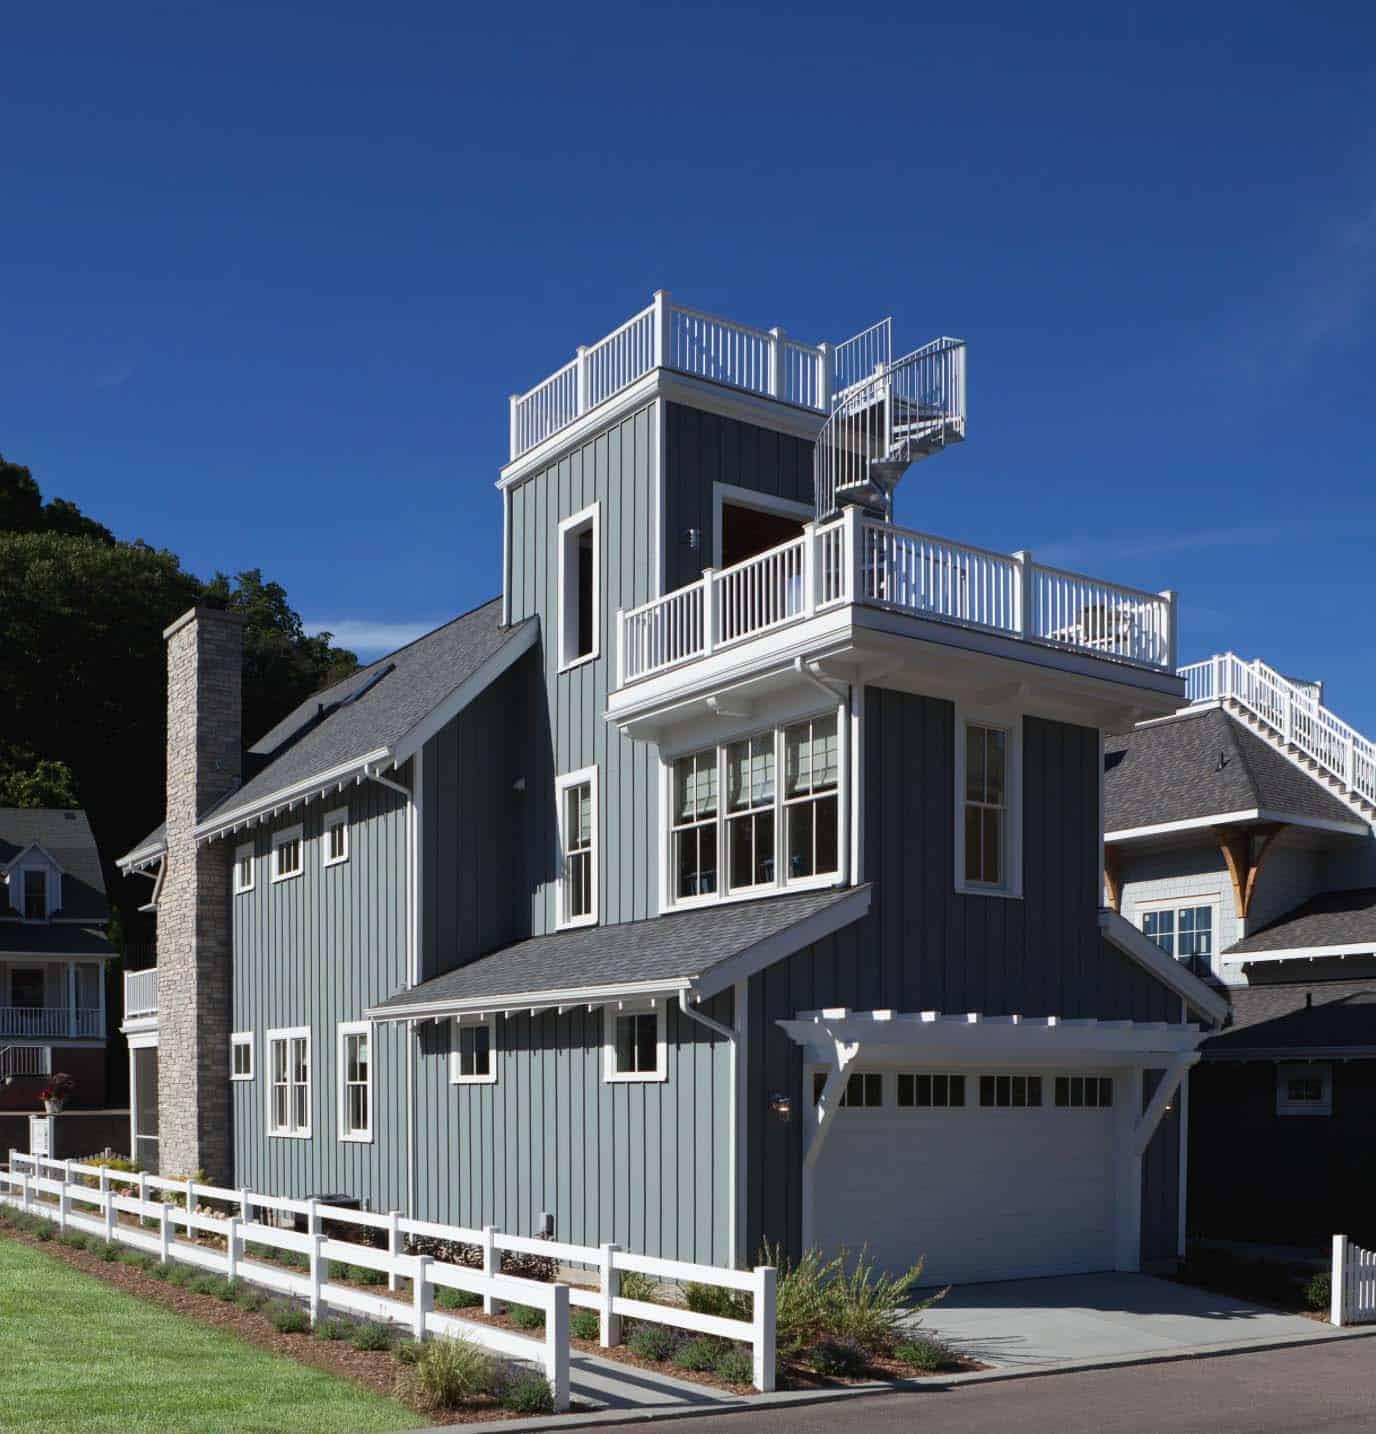 beach-style-cottage-exterior